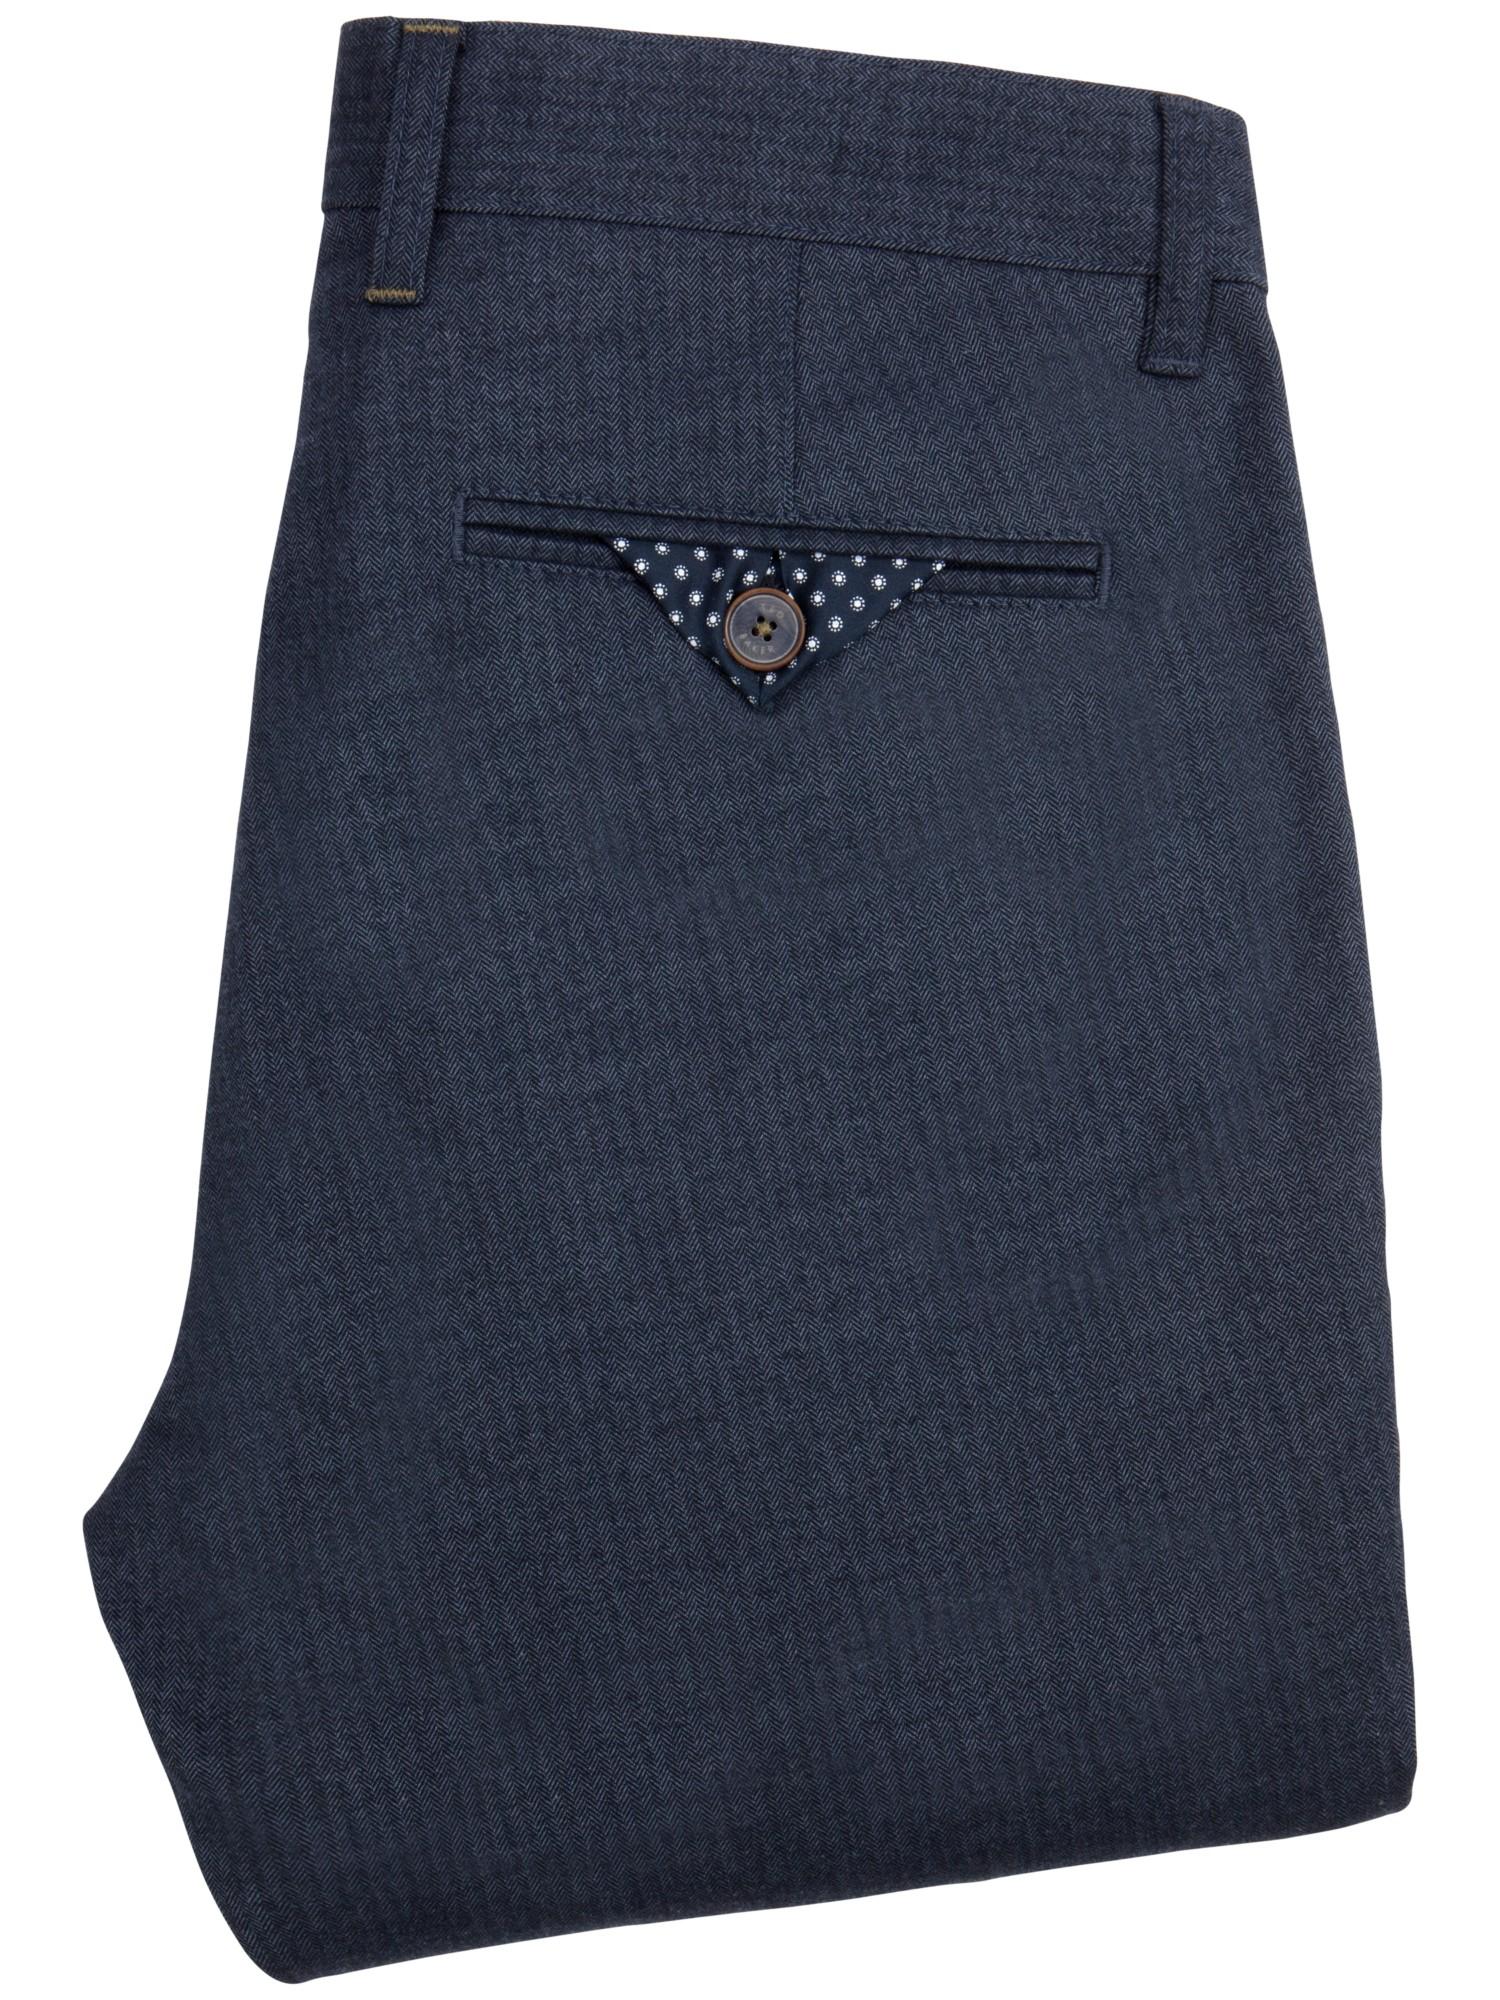 483b5a4cf2a33d Ted Baker Deerchi Slim Fit Herringbone Trousers in Blue for Men - Lyst